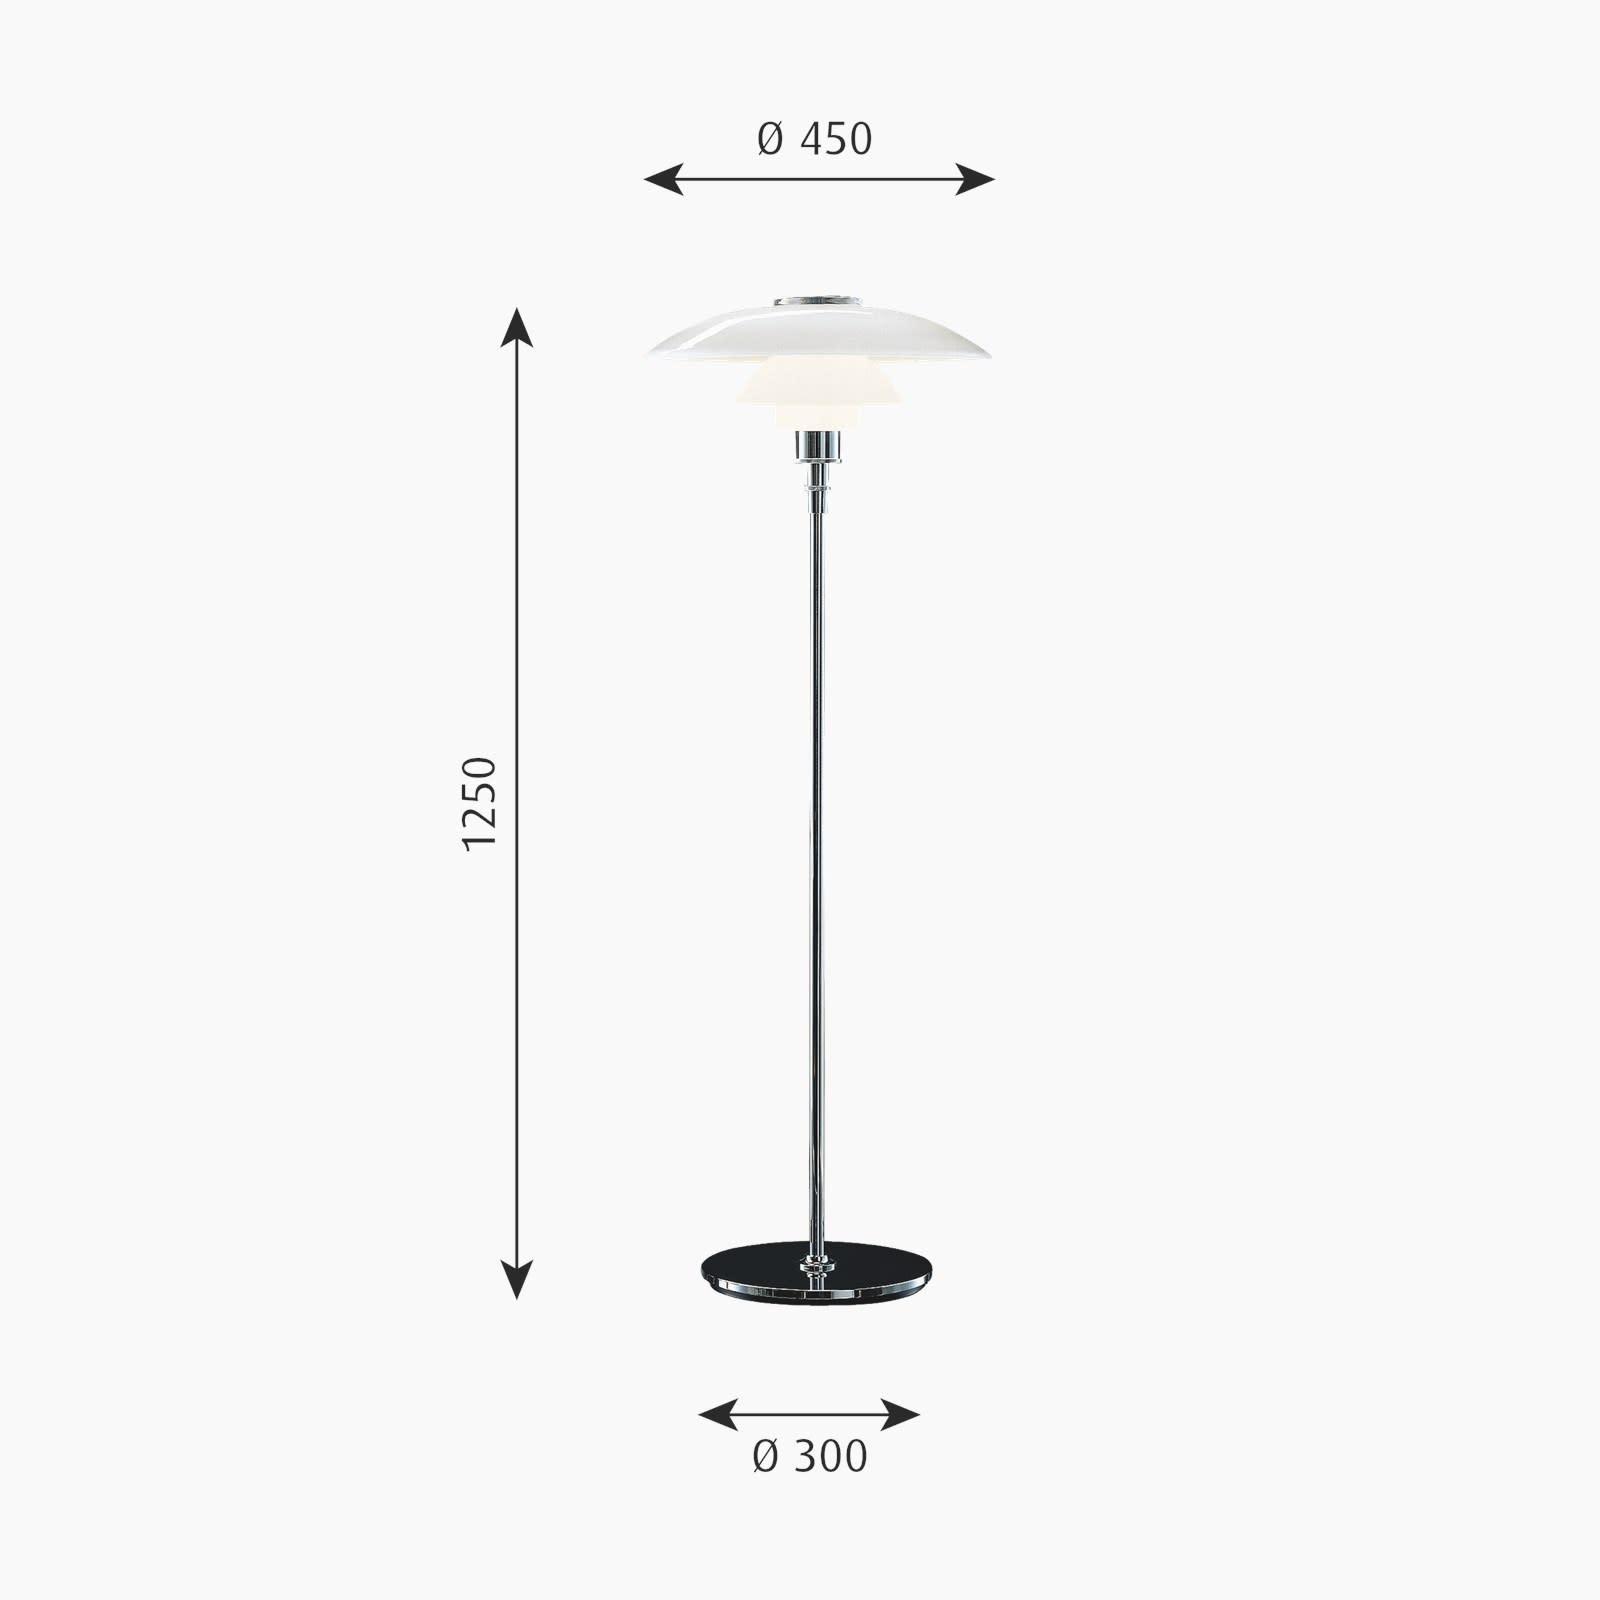 louis-poulsen-ph-4-3-lamp-dimensions